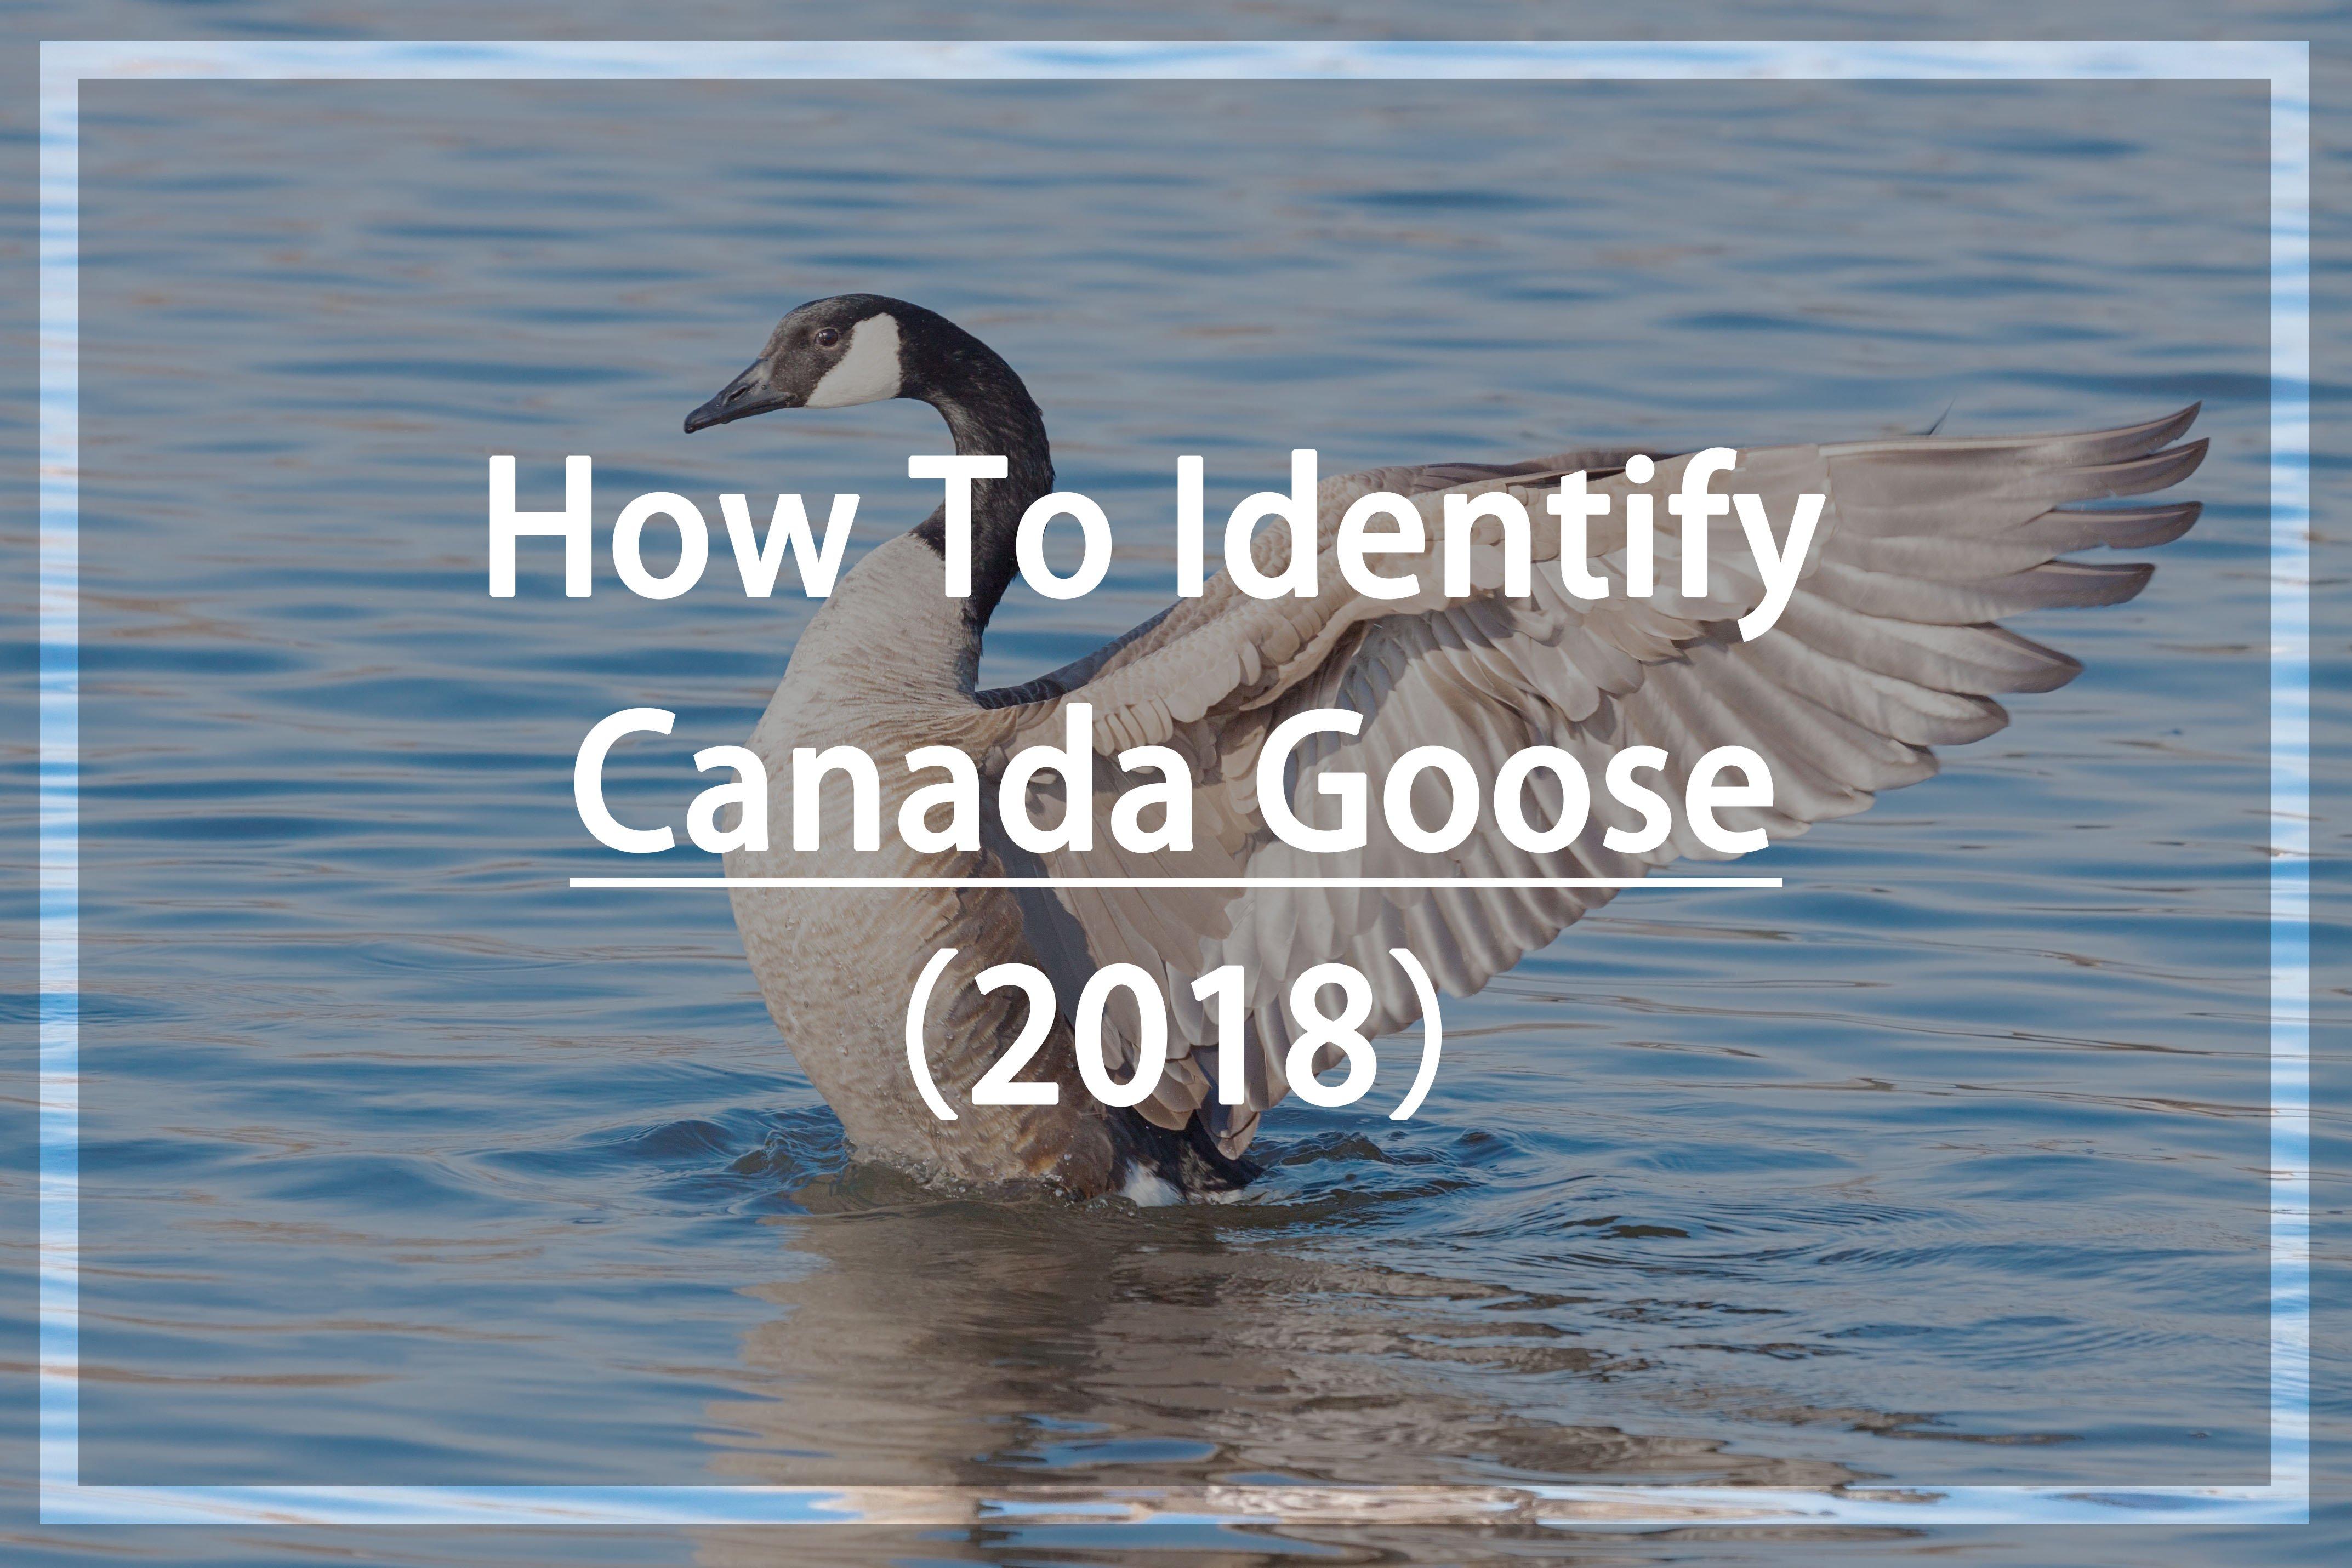 Identify Canada Goose